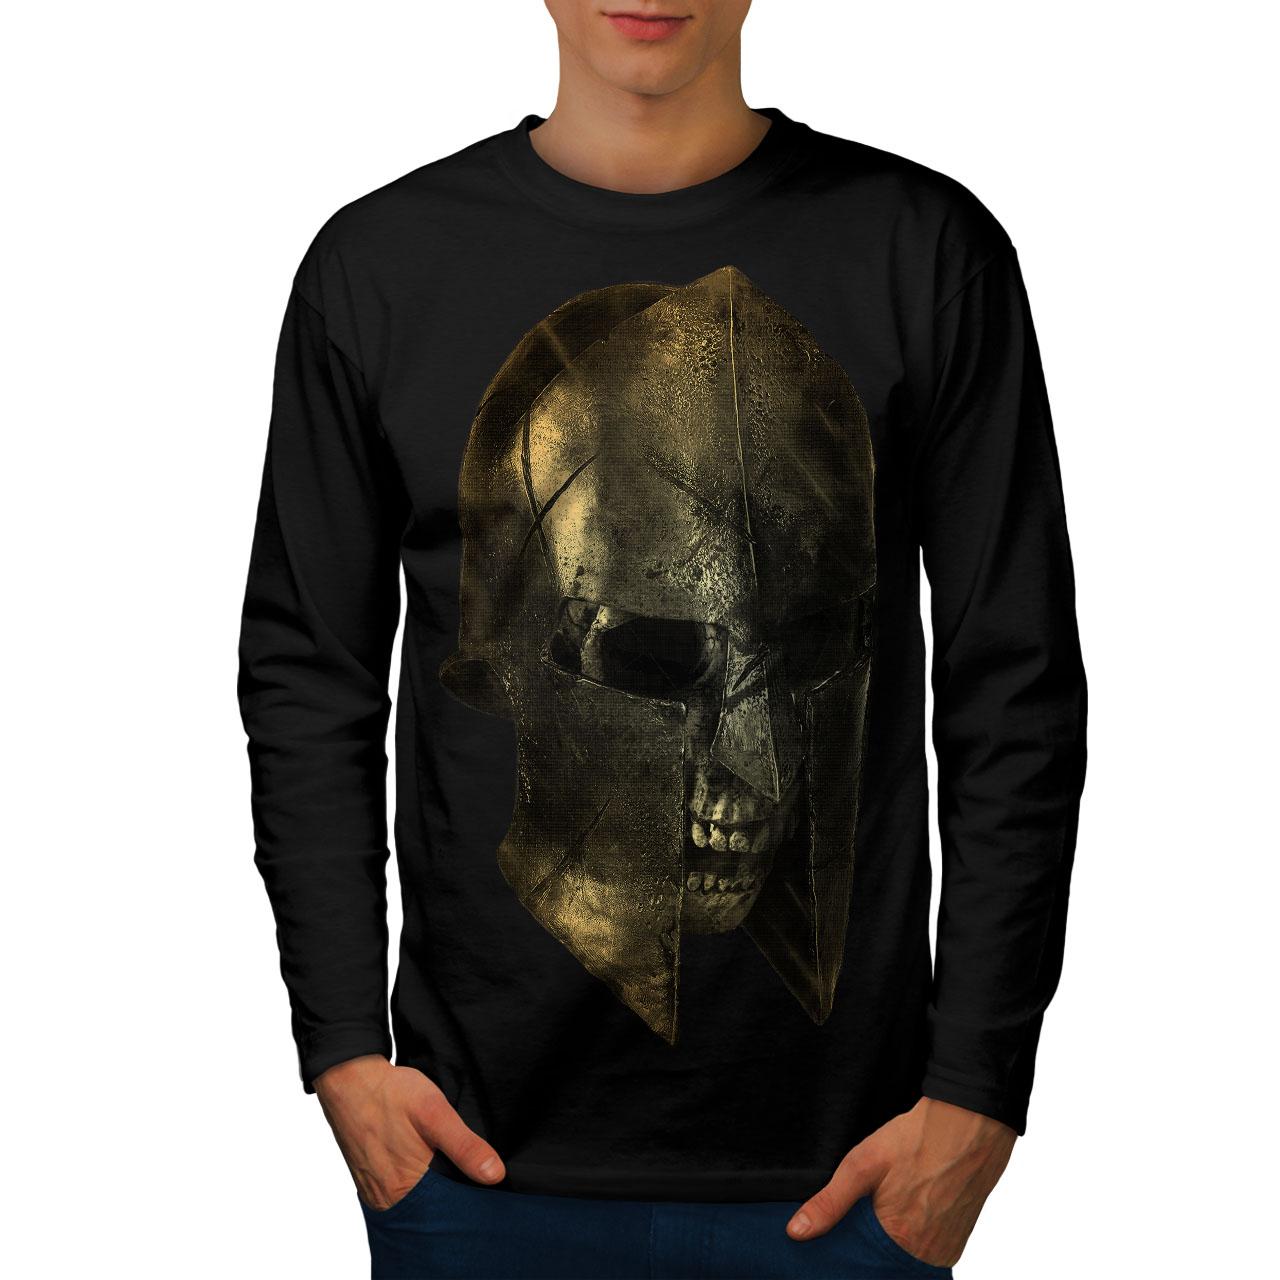 Wellcoda-Skull-Sparta-Warrior-Mens-Long-Sleeve-T-shirt-Battle-Graphic-Design